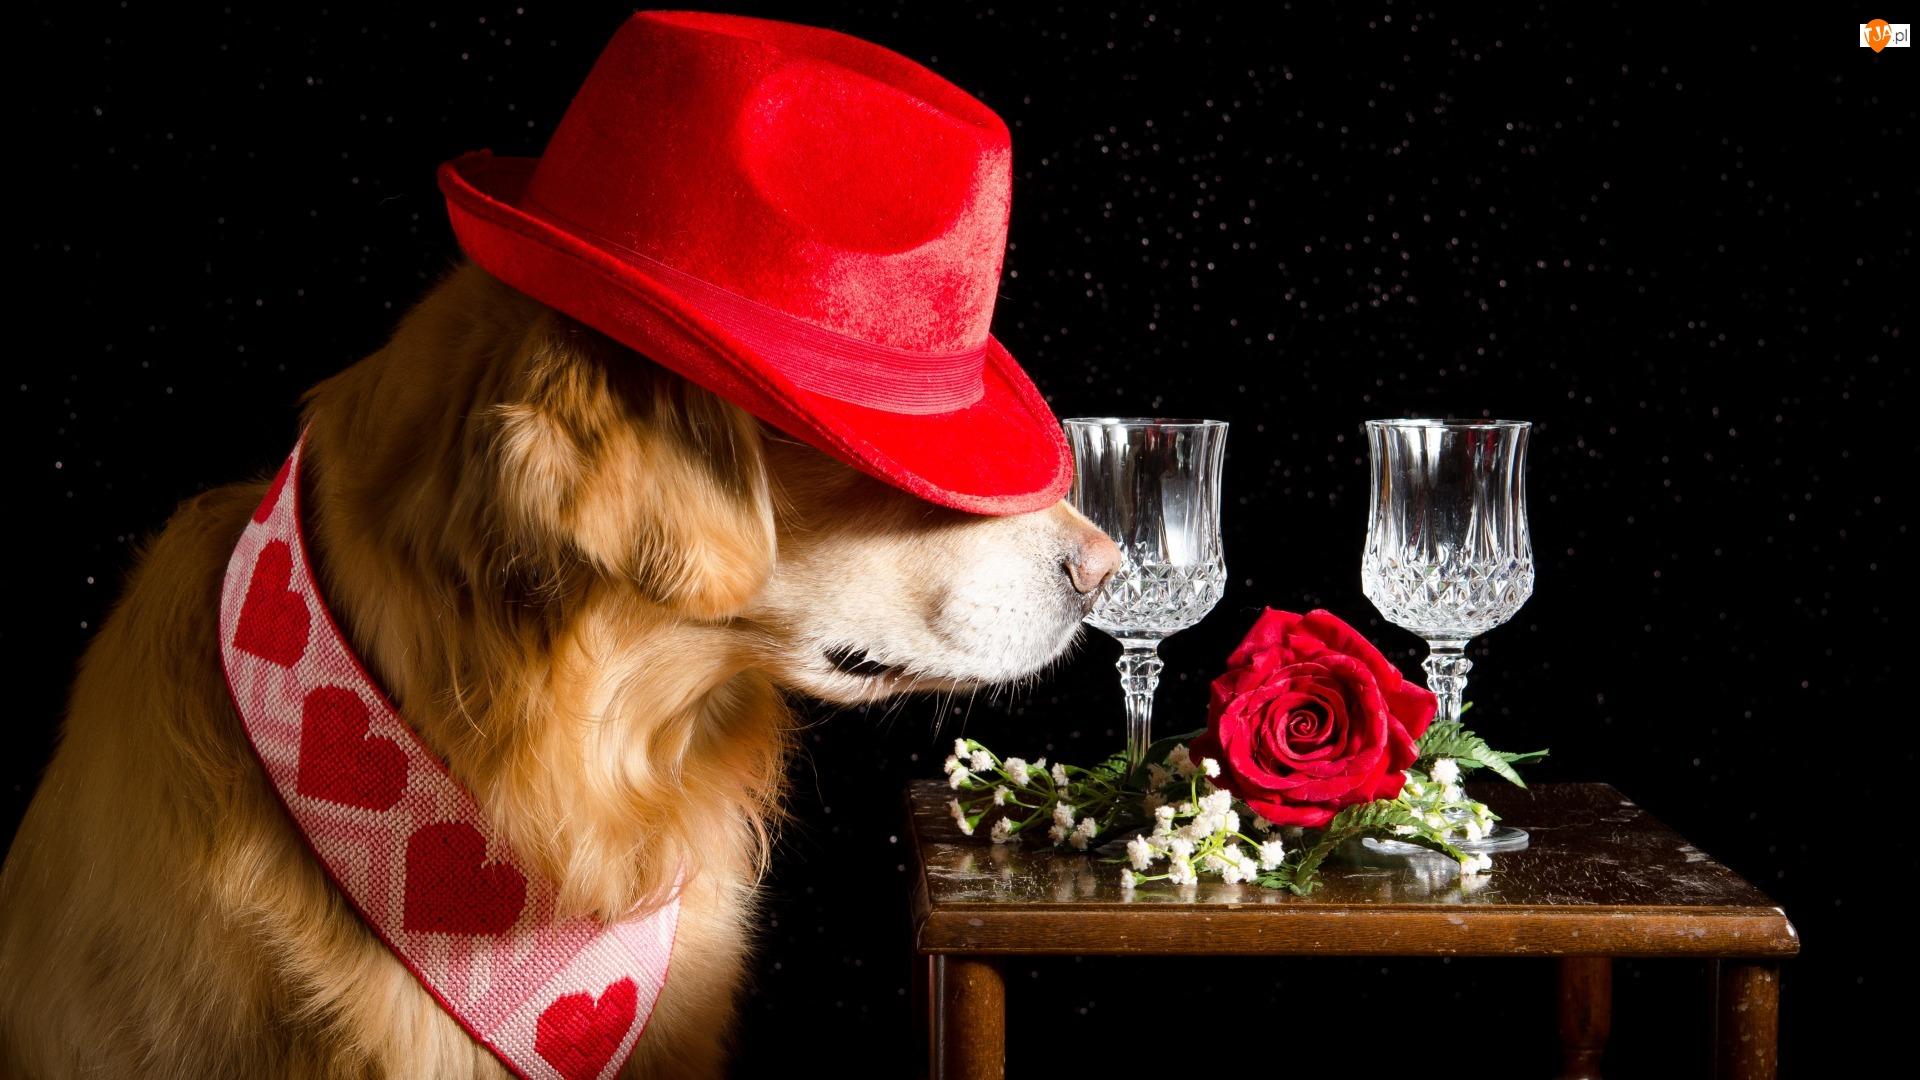 Kieliszki, Stolik, Golden Retriever, Pies, Czarne tło, Kapelusz, Róża